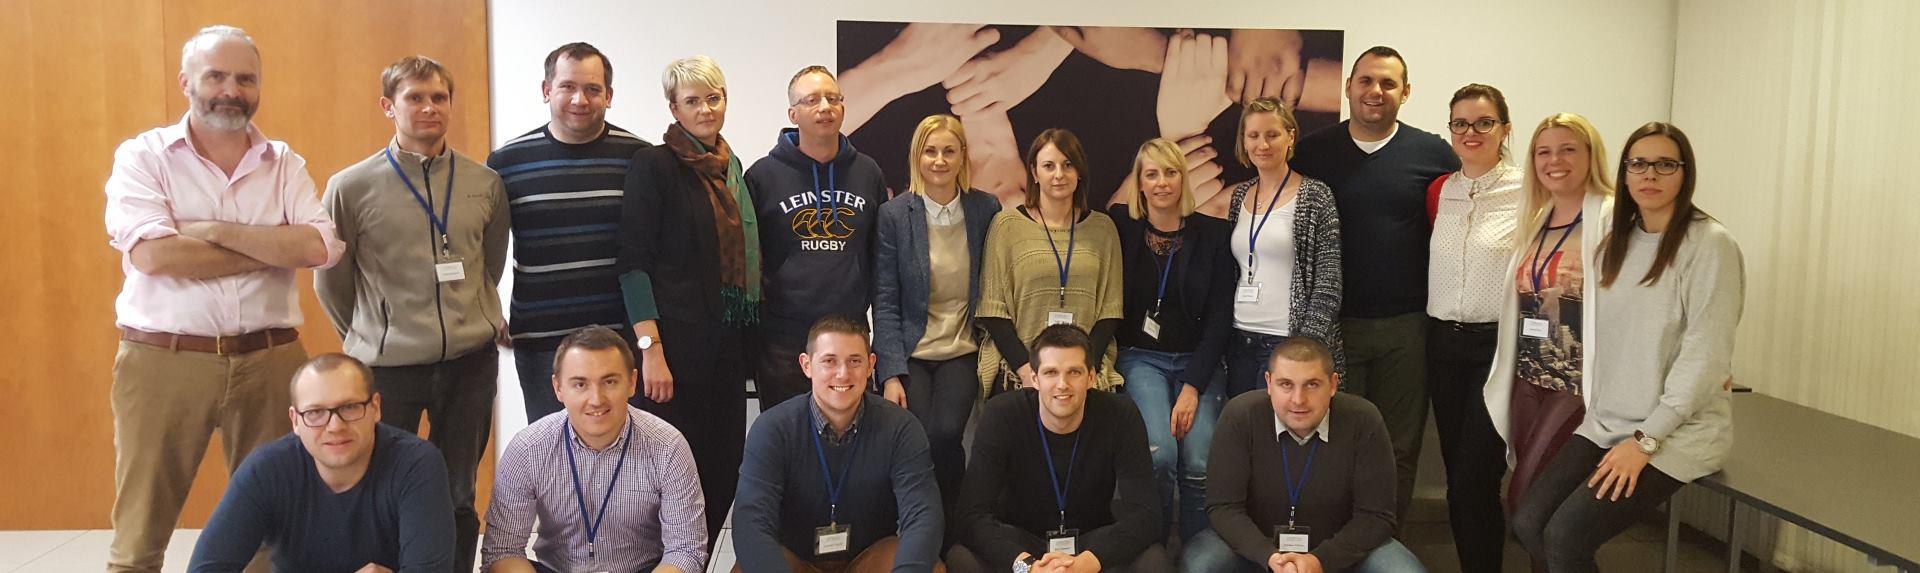 PIK Vrbovec i COTRUGLI Business School razvili poseban program edukacija i usavršavanja za zaposlenike